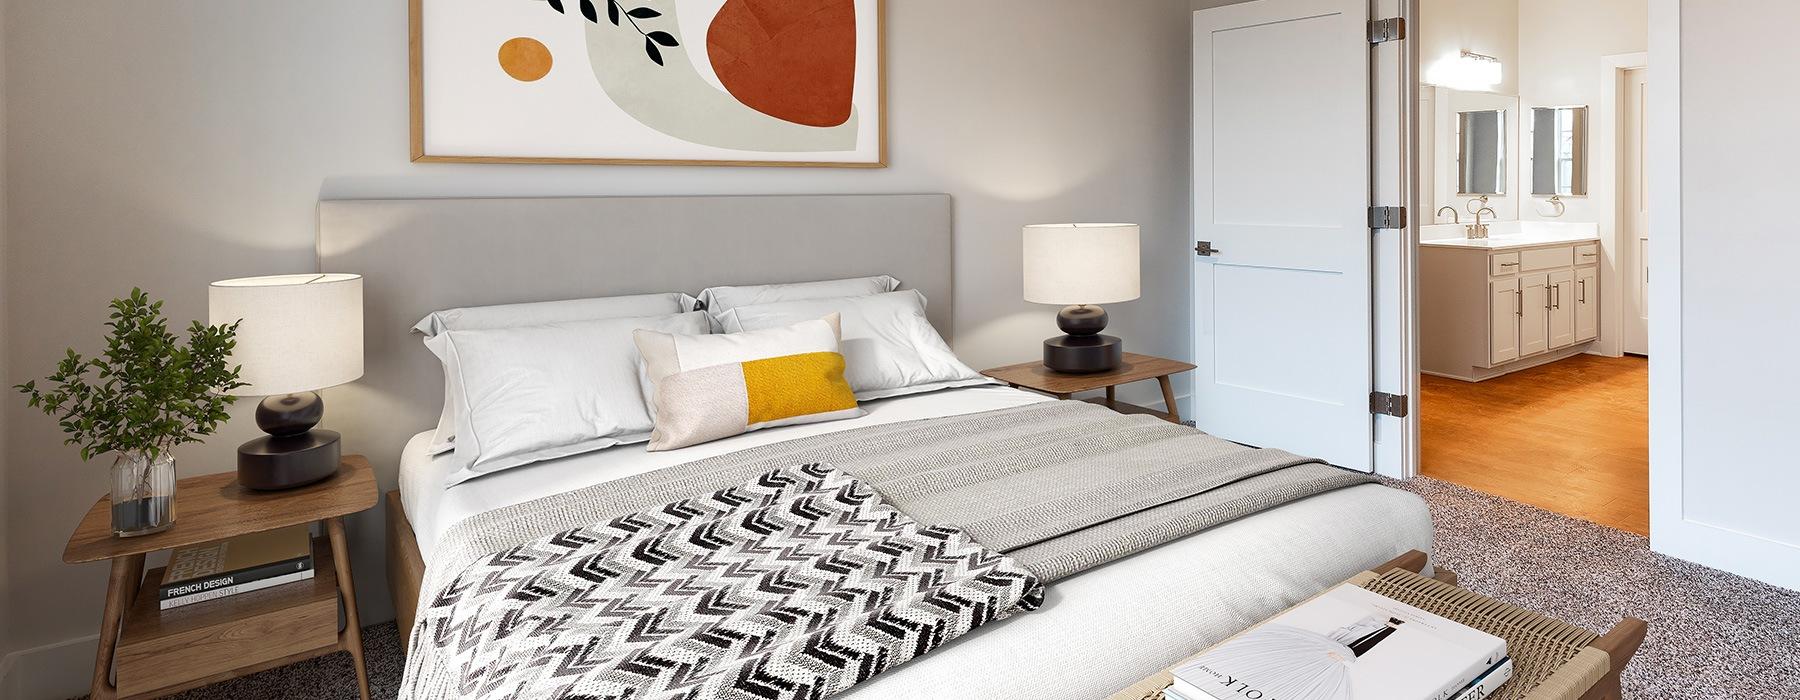 spacious bedroom on wood-style flooring